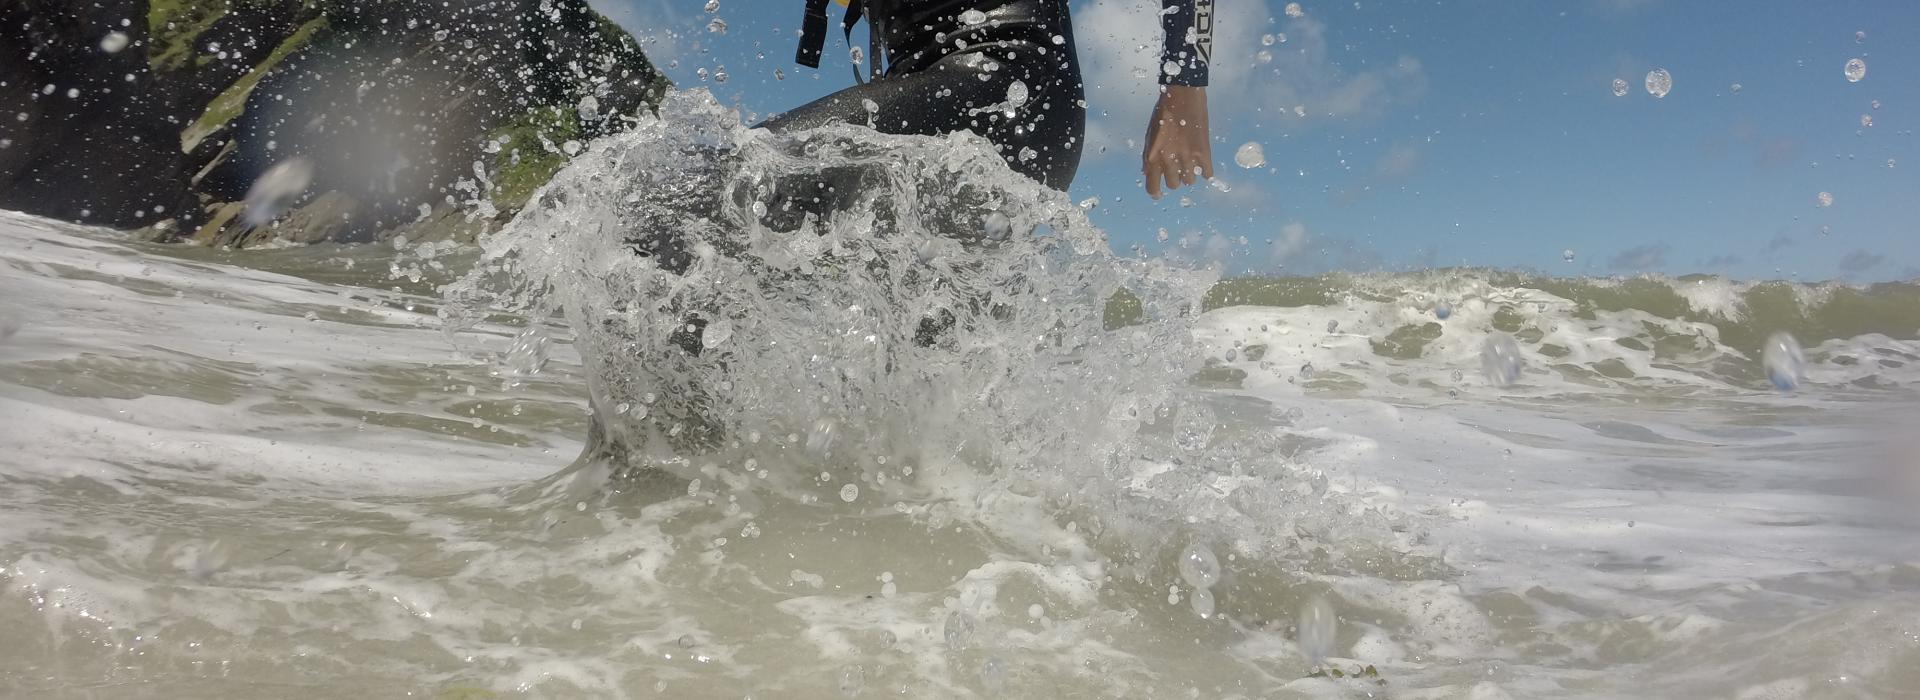 SLSGB qualification, surf coach, SLSGB, watersports instructor